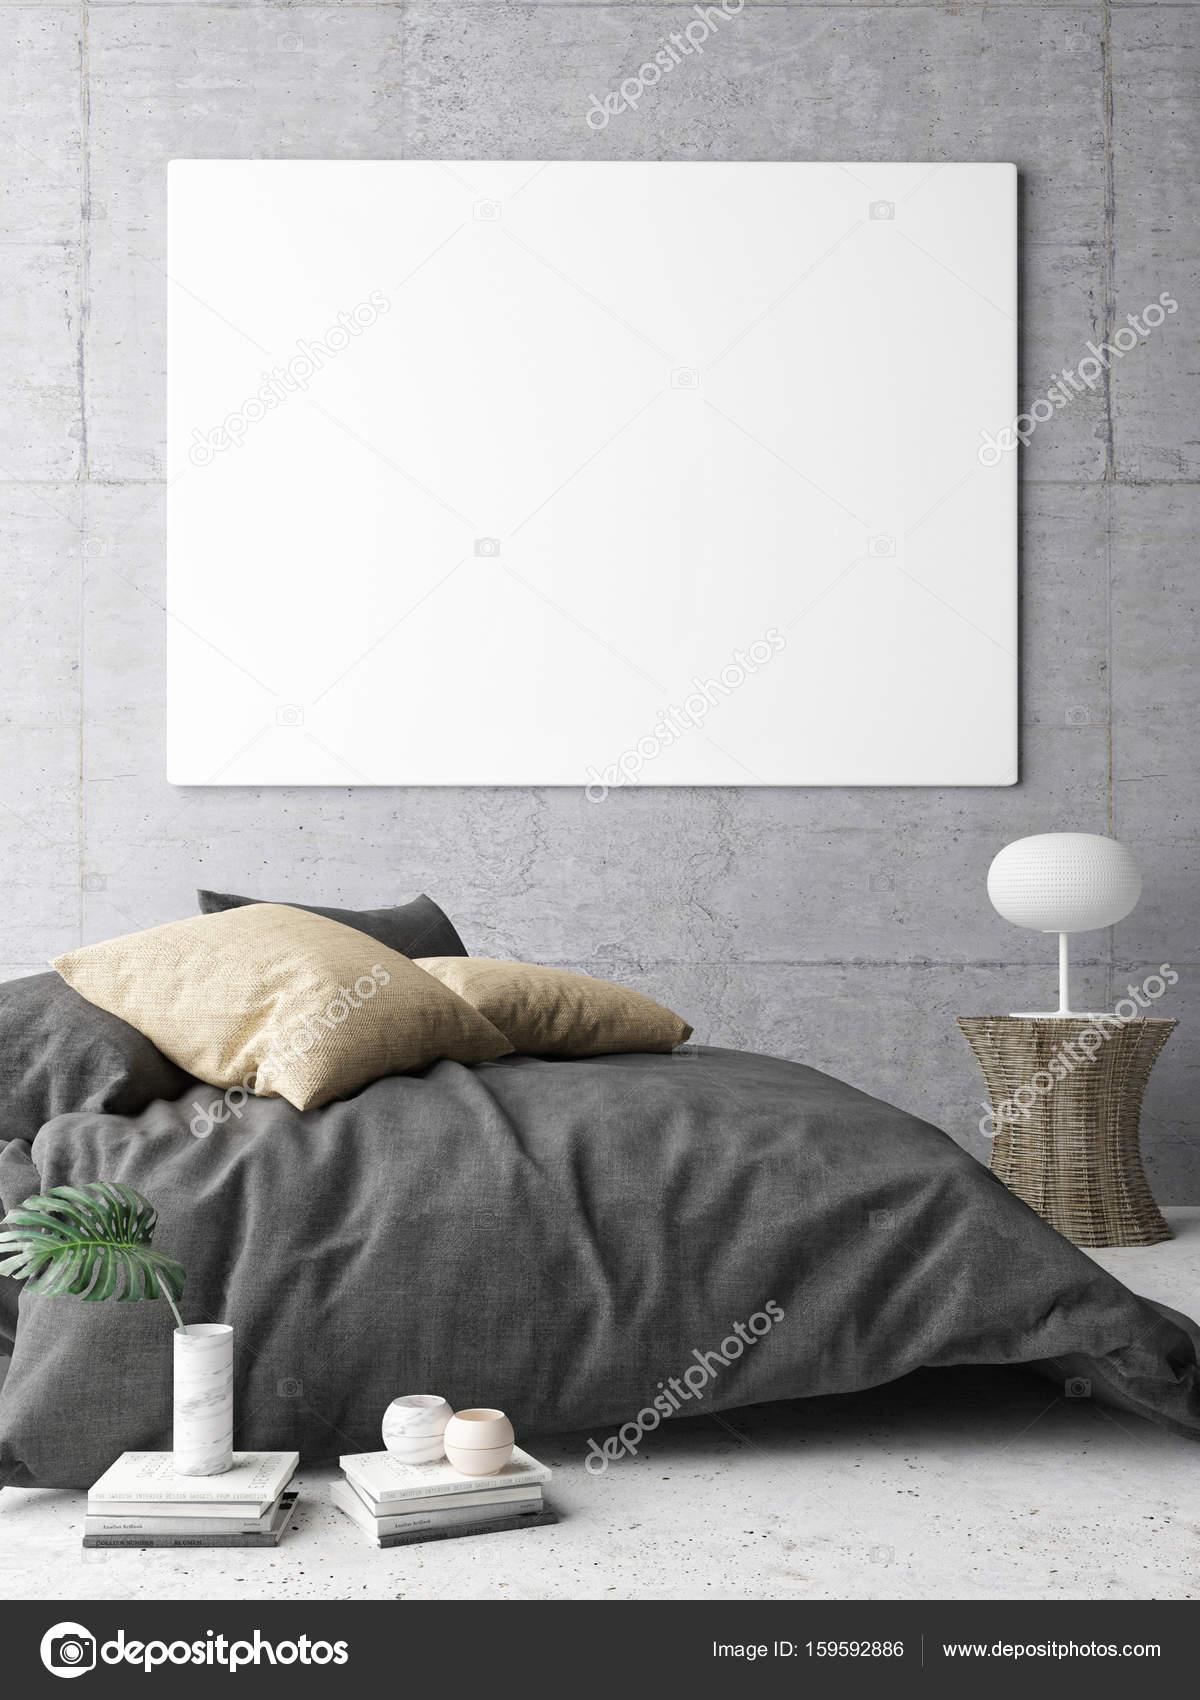 https://st3.depositphotos.com/2332949/15959/i/1600/depositphotos_159592886-stockafbeelding-poster-in-hipster-slaapkamer.jpg